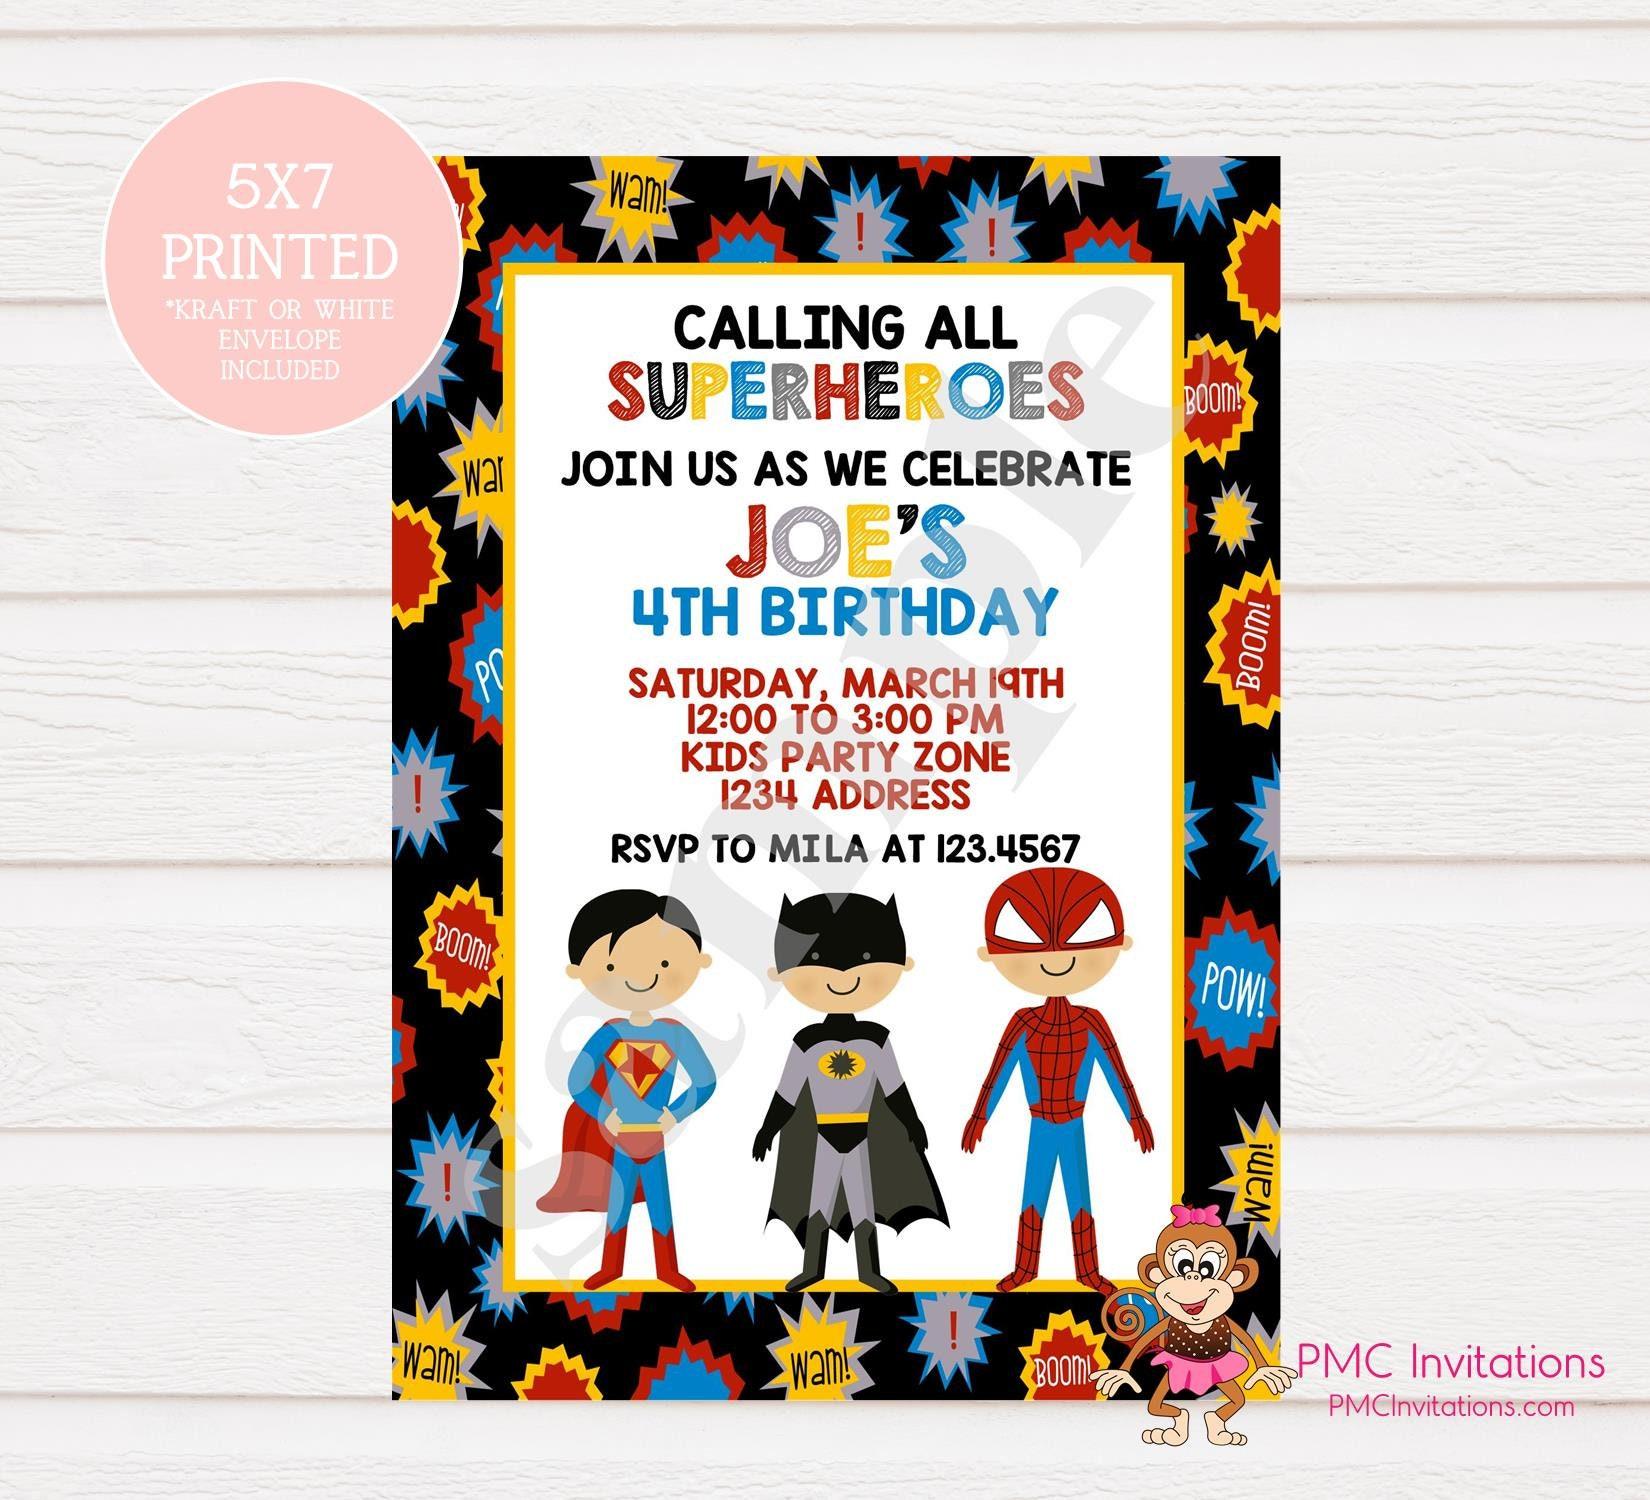 Custom Printed Superhero Birthday Invitations 1.00 each with | Etsy